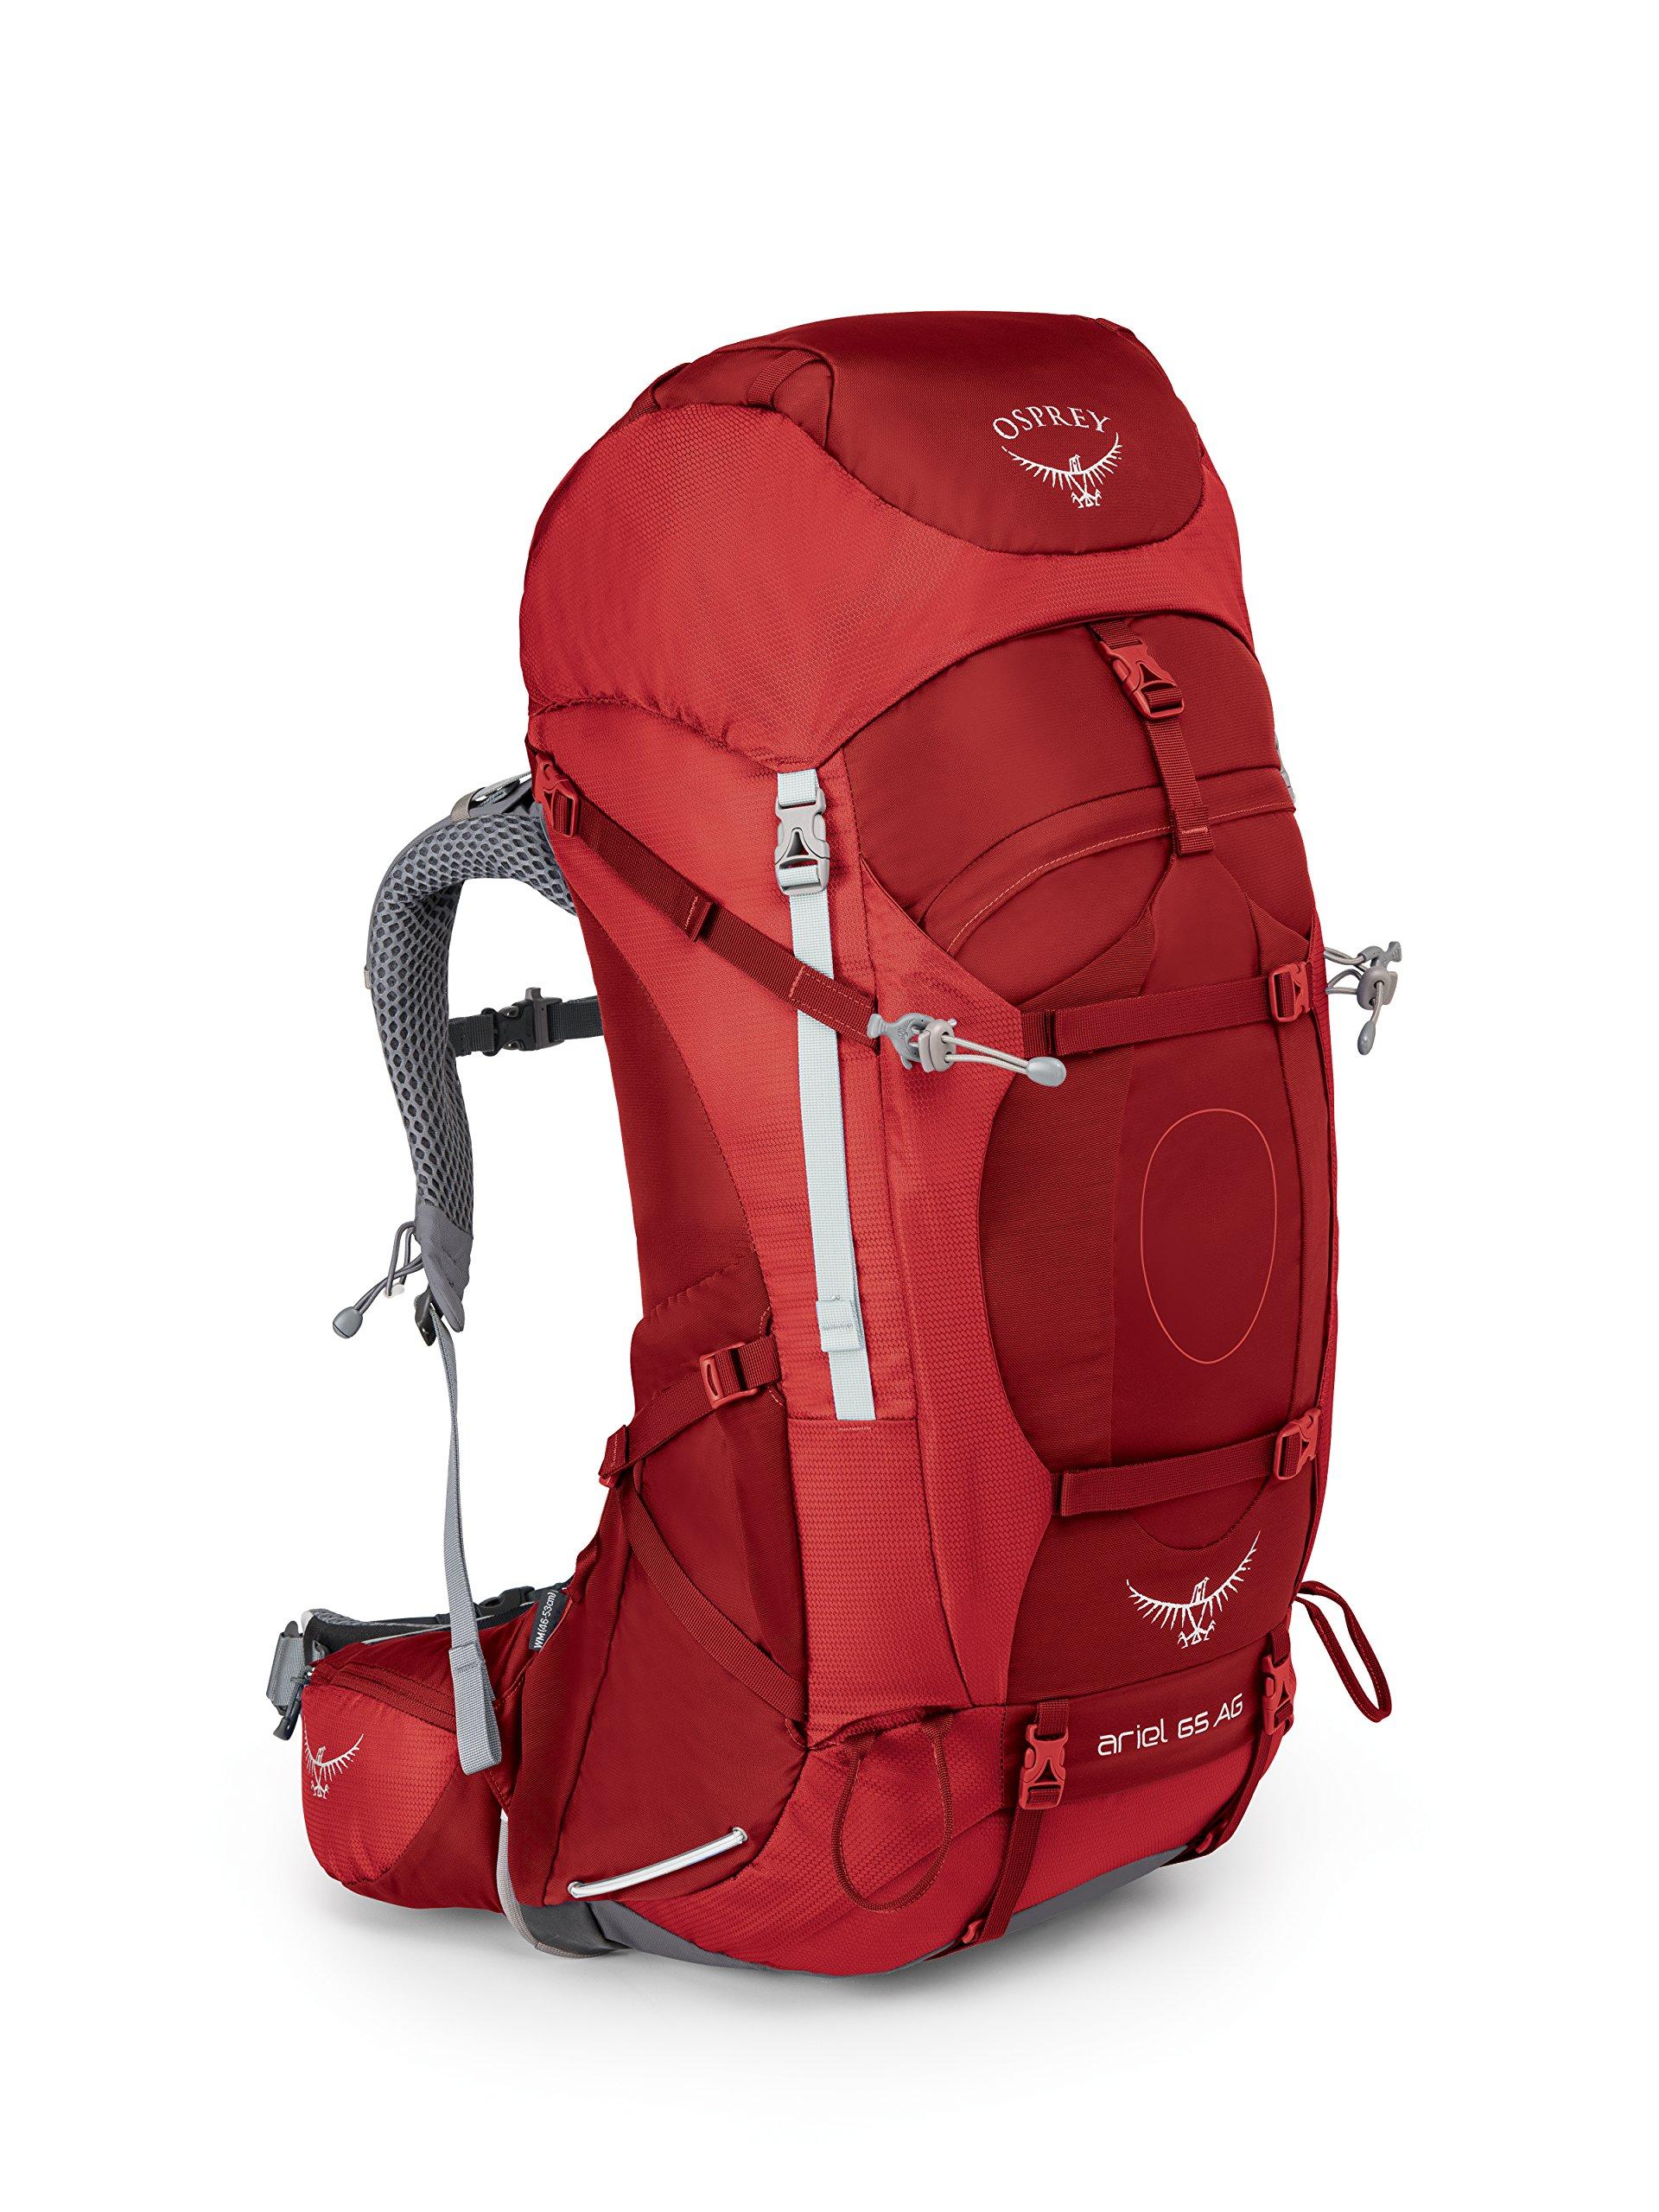 Osprey Packs Women's Ariel AG 65 Backpack, Picante Red, Medium